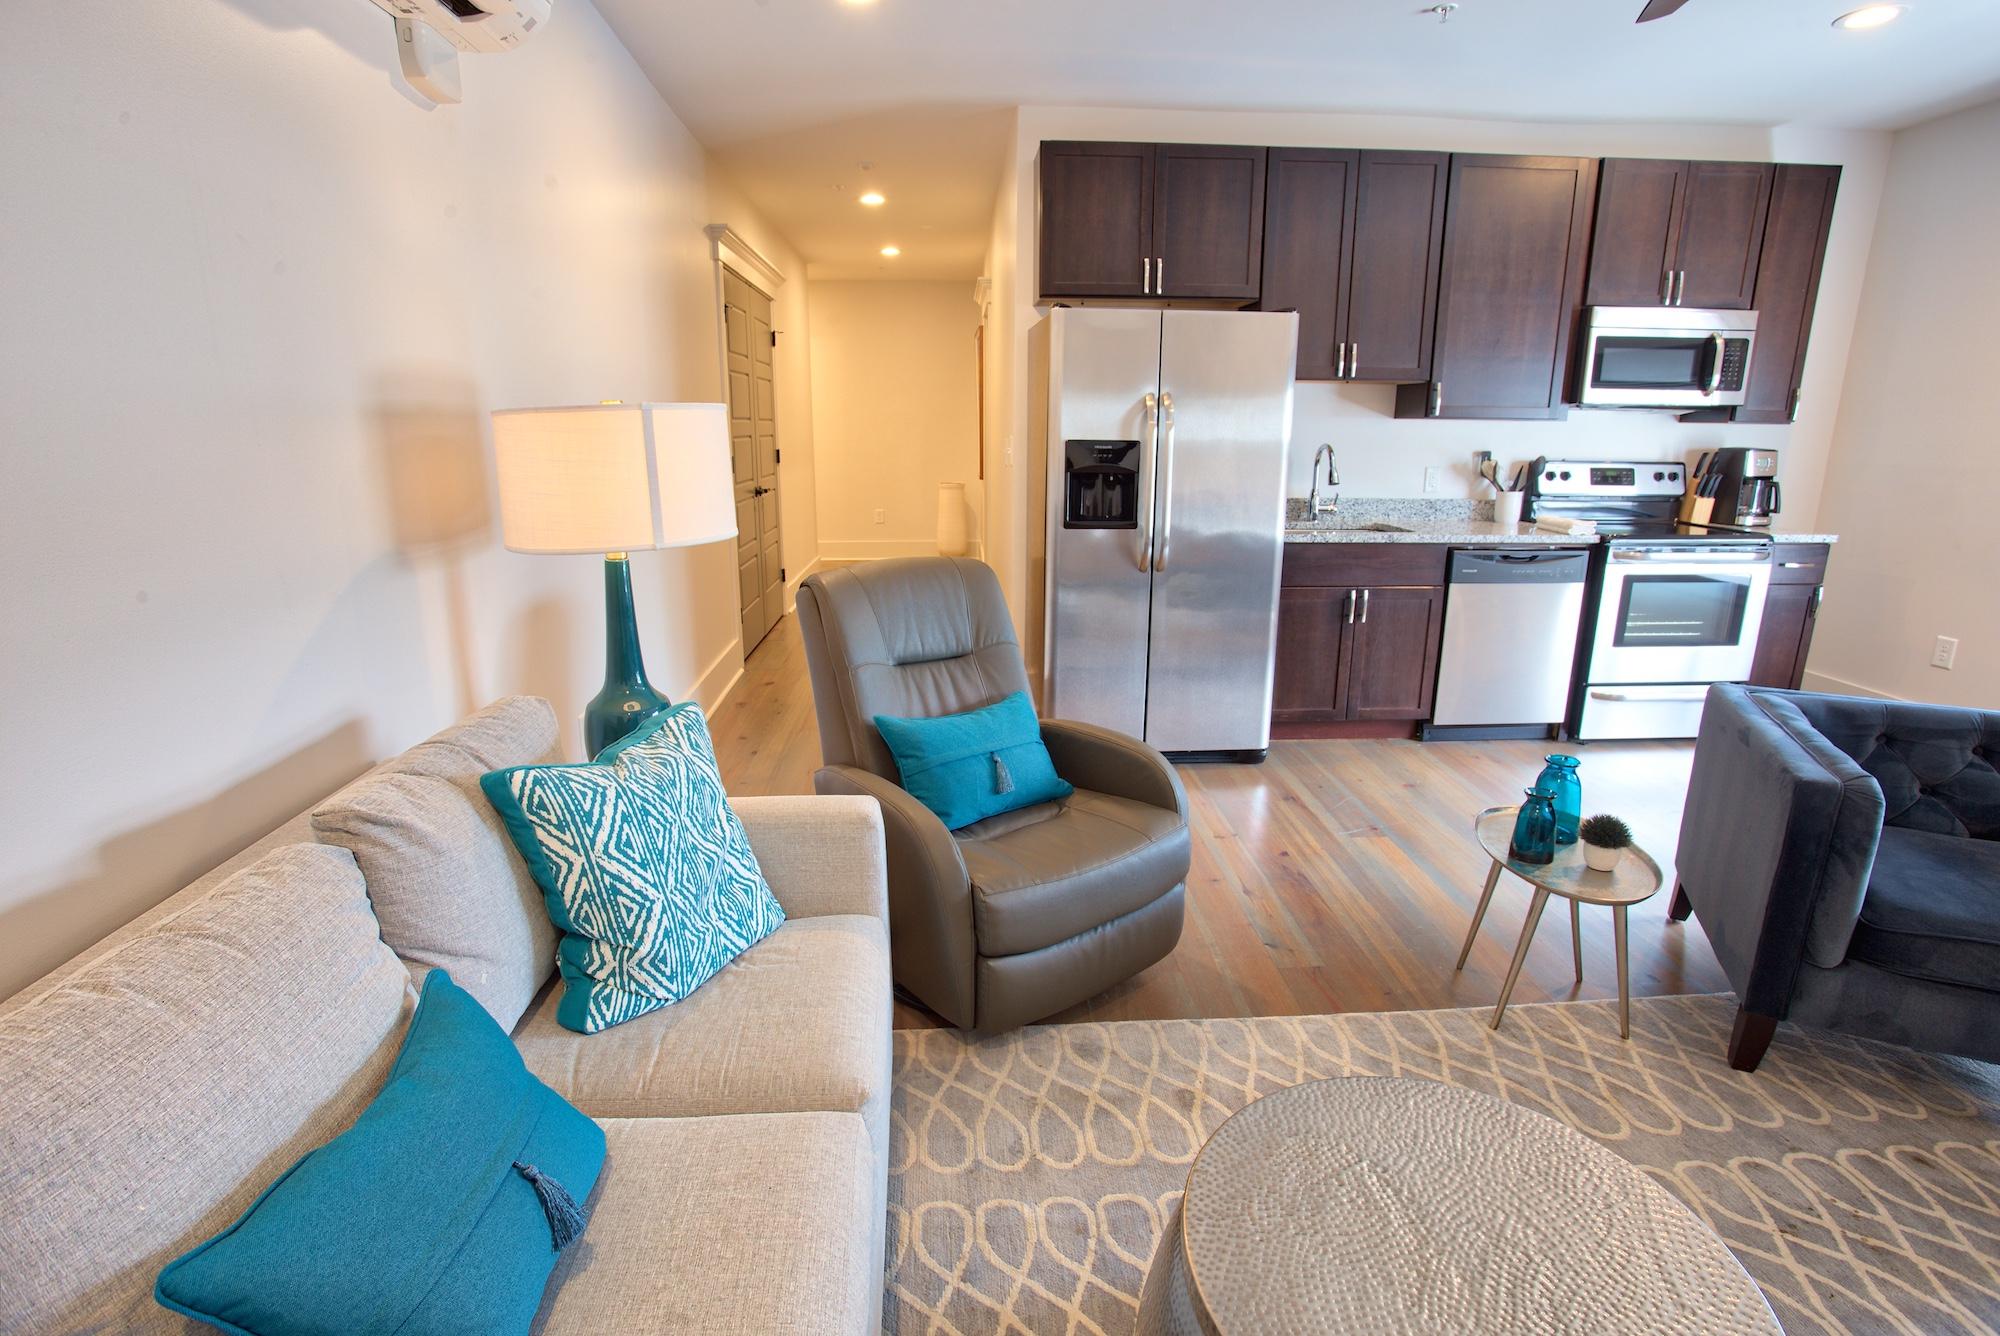 Suite on King Street Charleston SC Vacation Rental The Gullah Suite21.jpeg